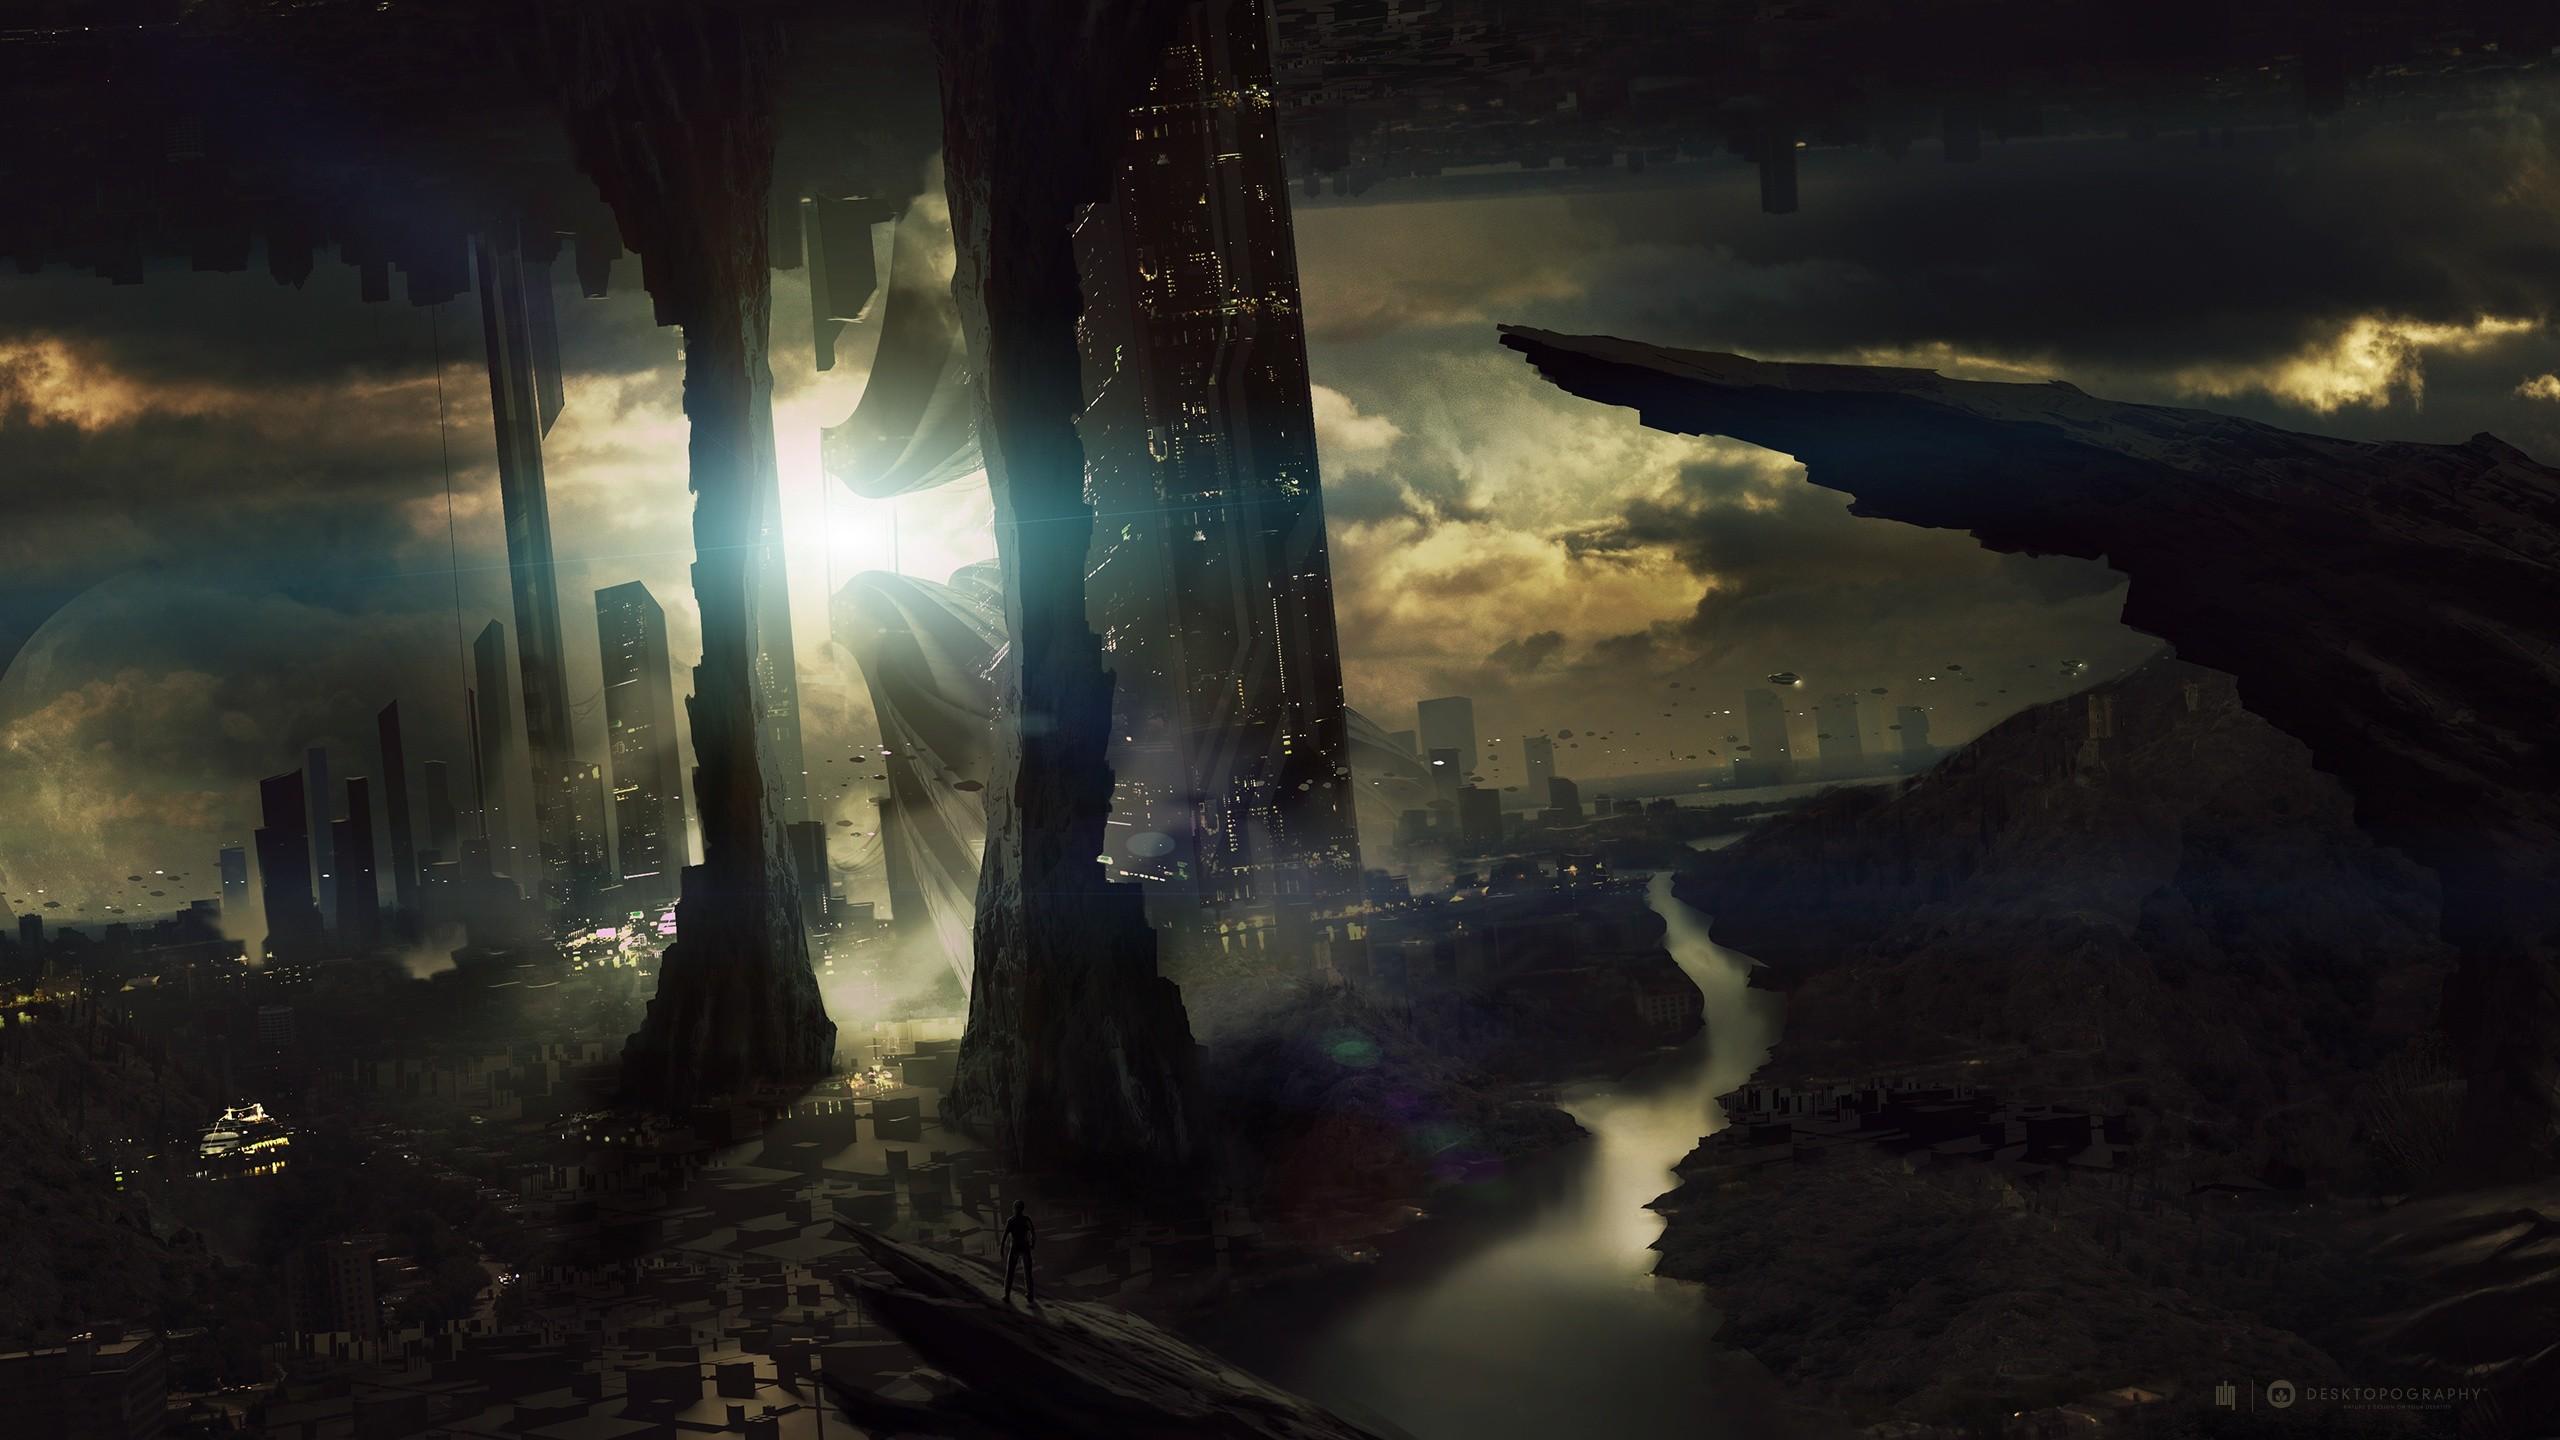 Explore Sci Fi Wallpaper, City Wallpaper, and more!